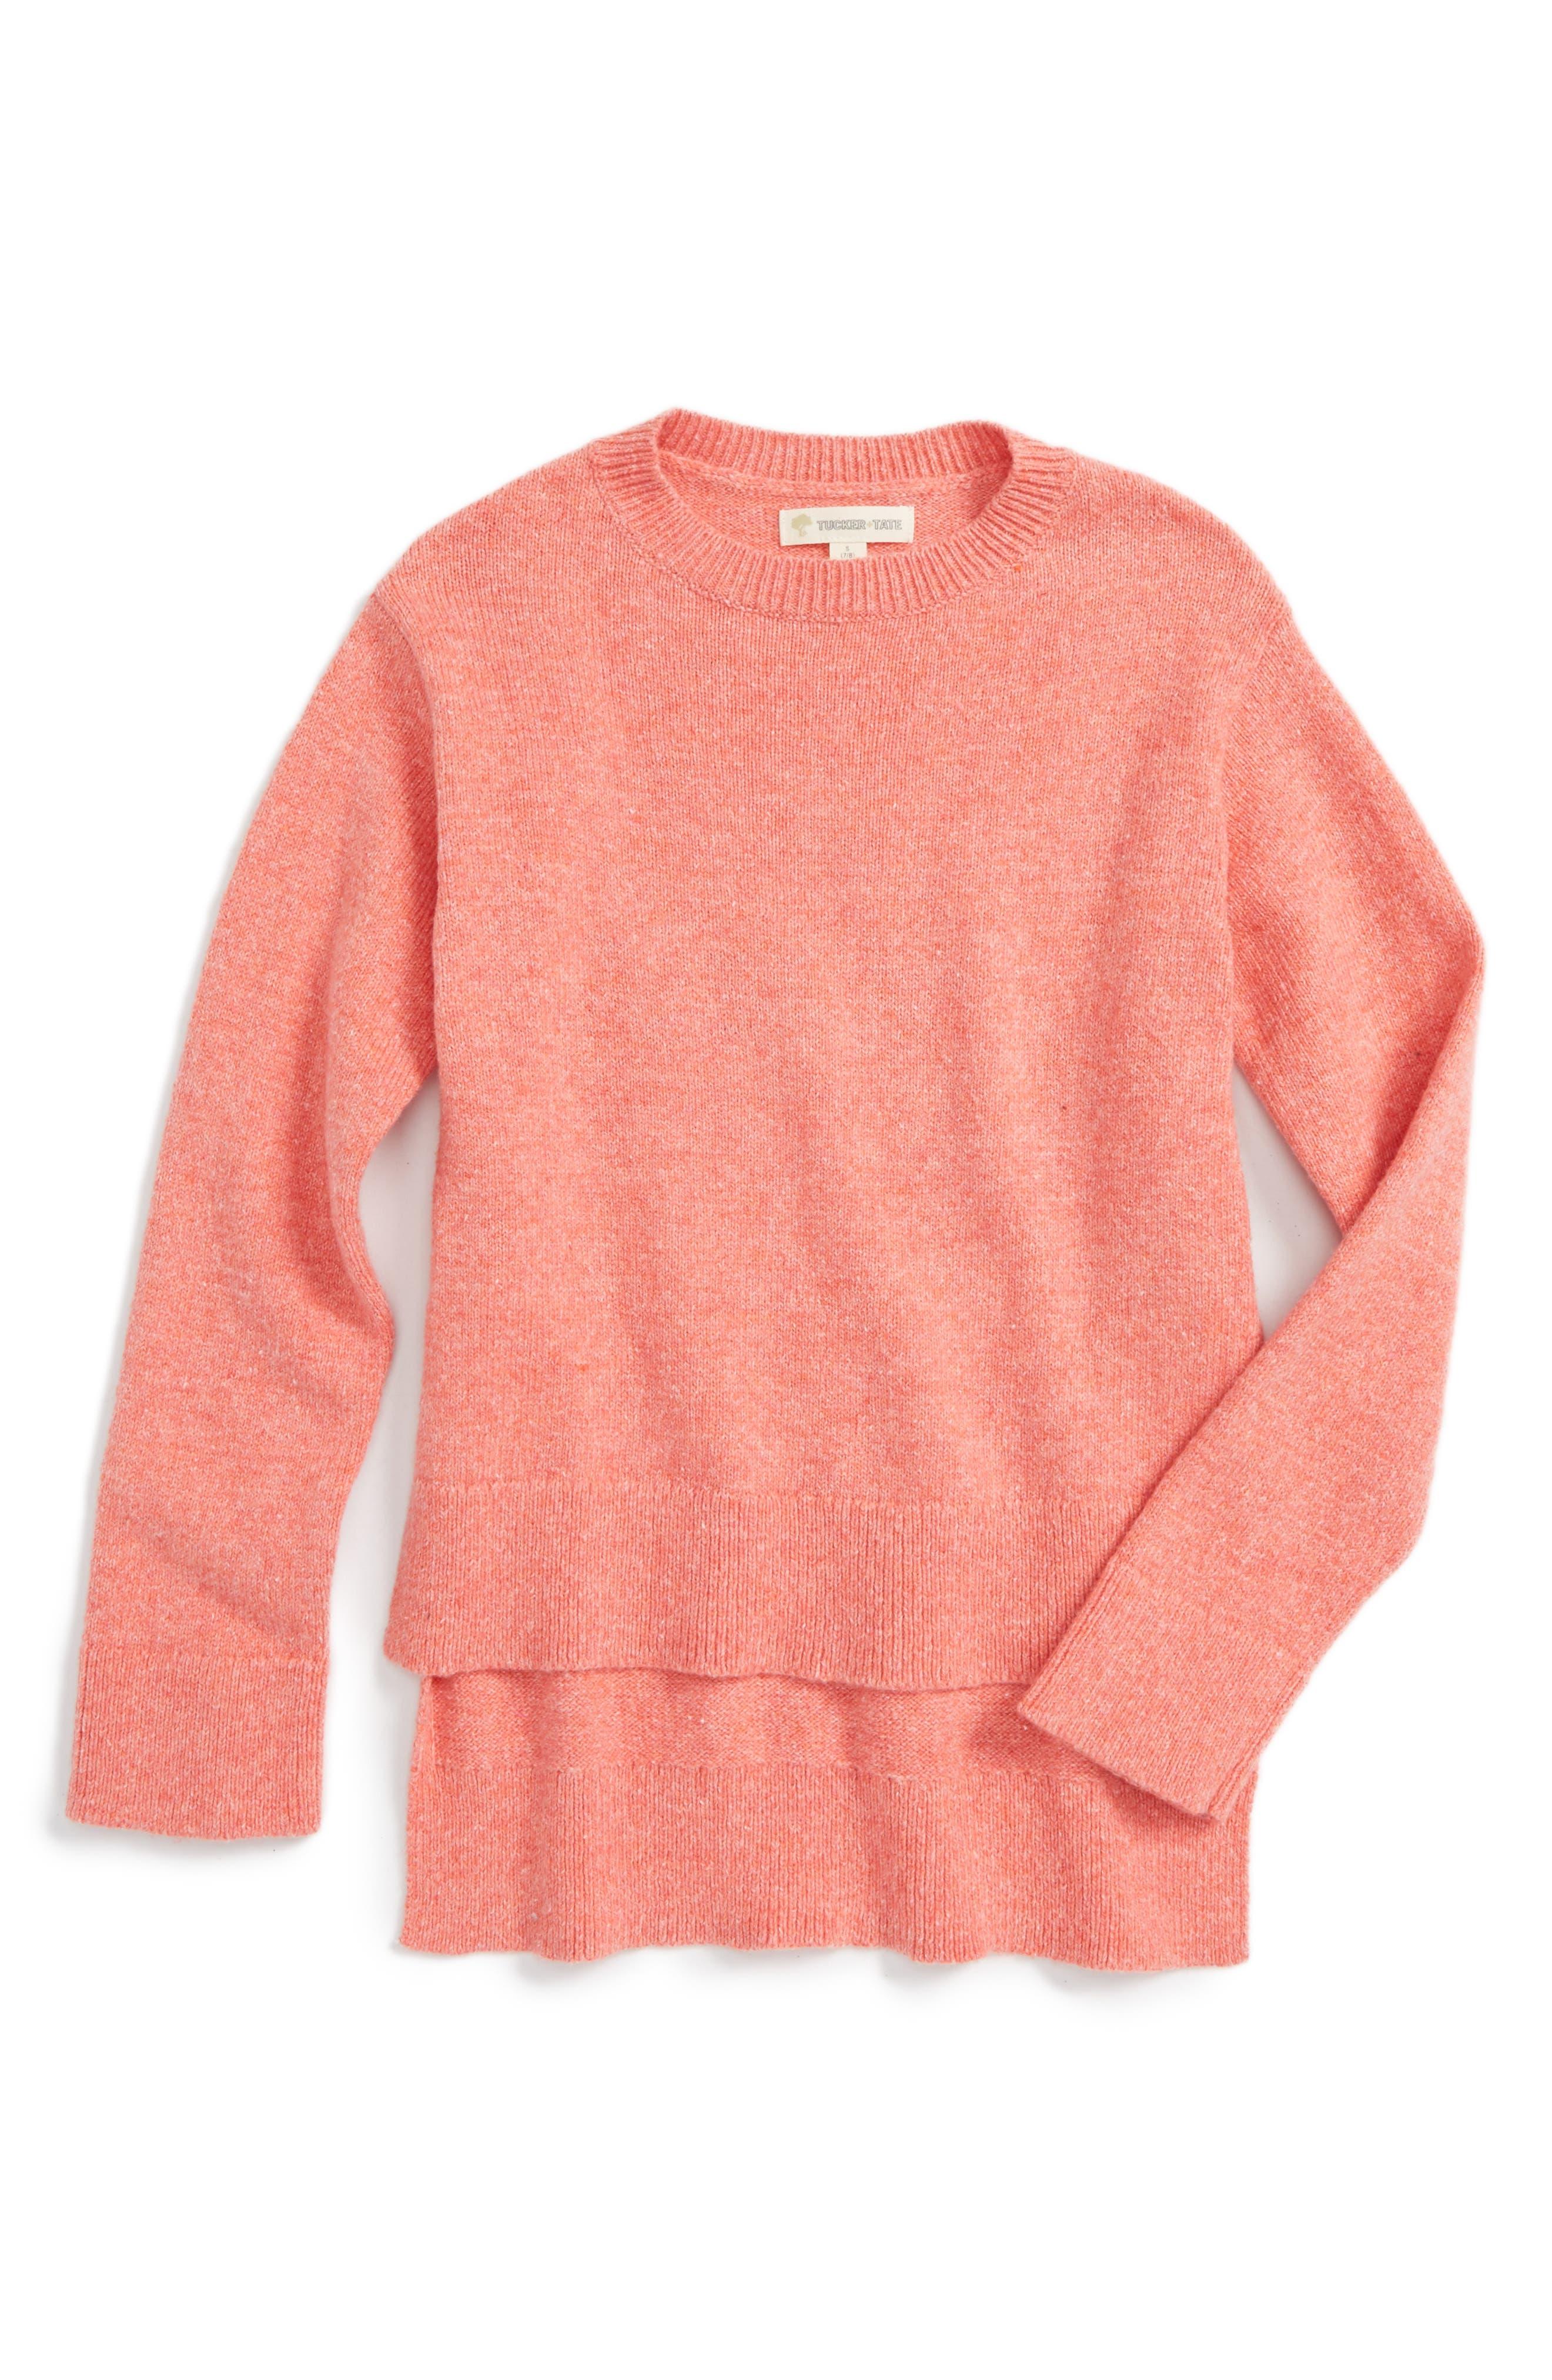 Alternate Image 1 Selected - Tucker + Tate High/Low Sweater (Big Girls)